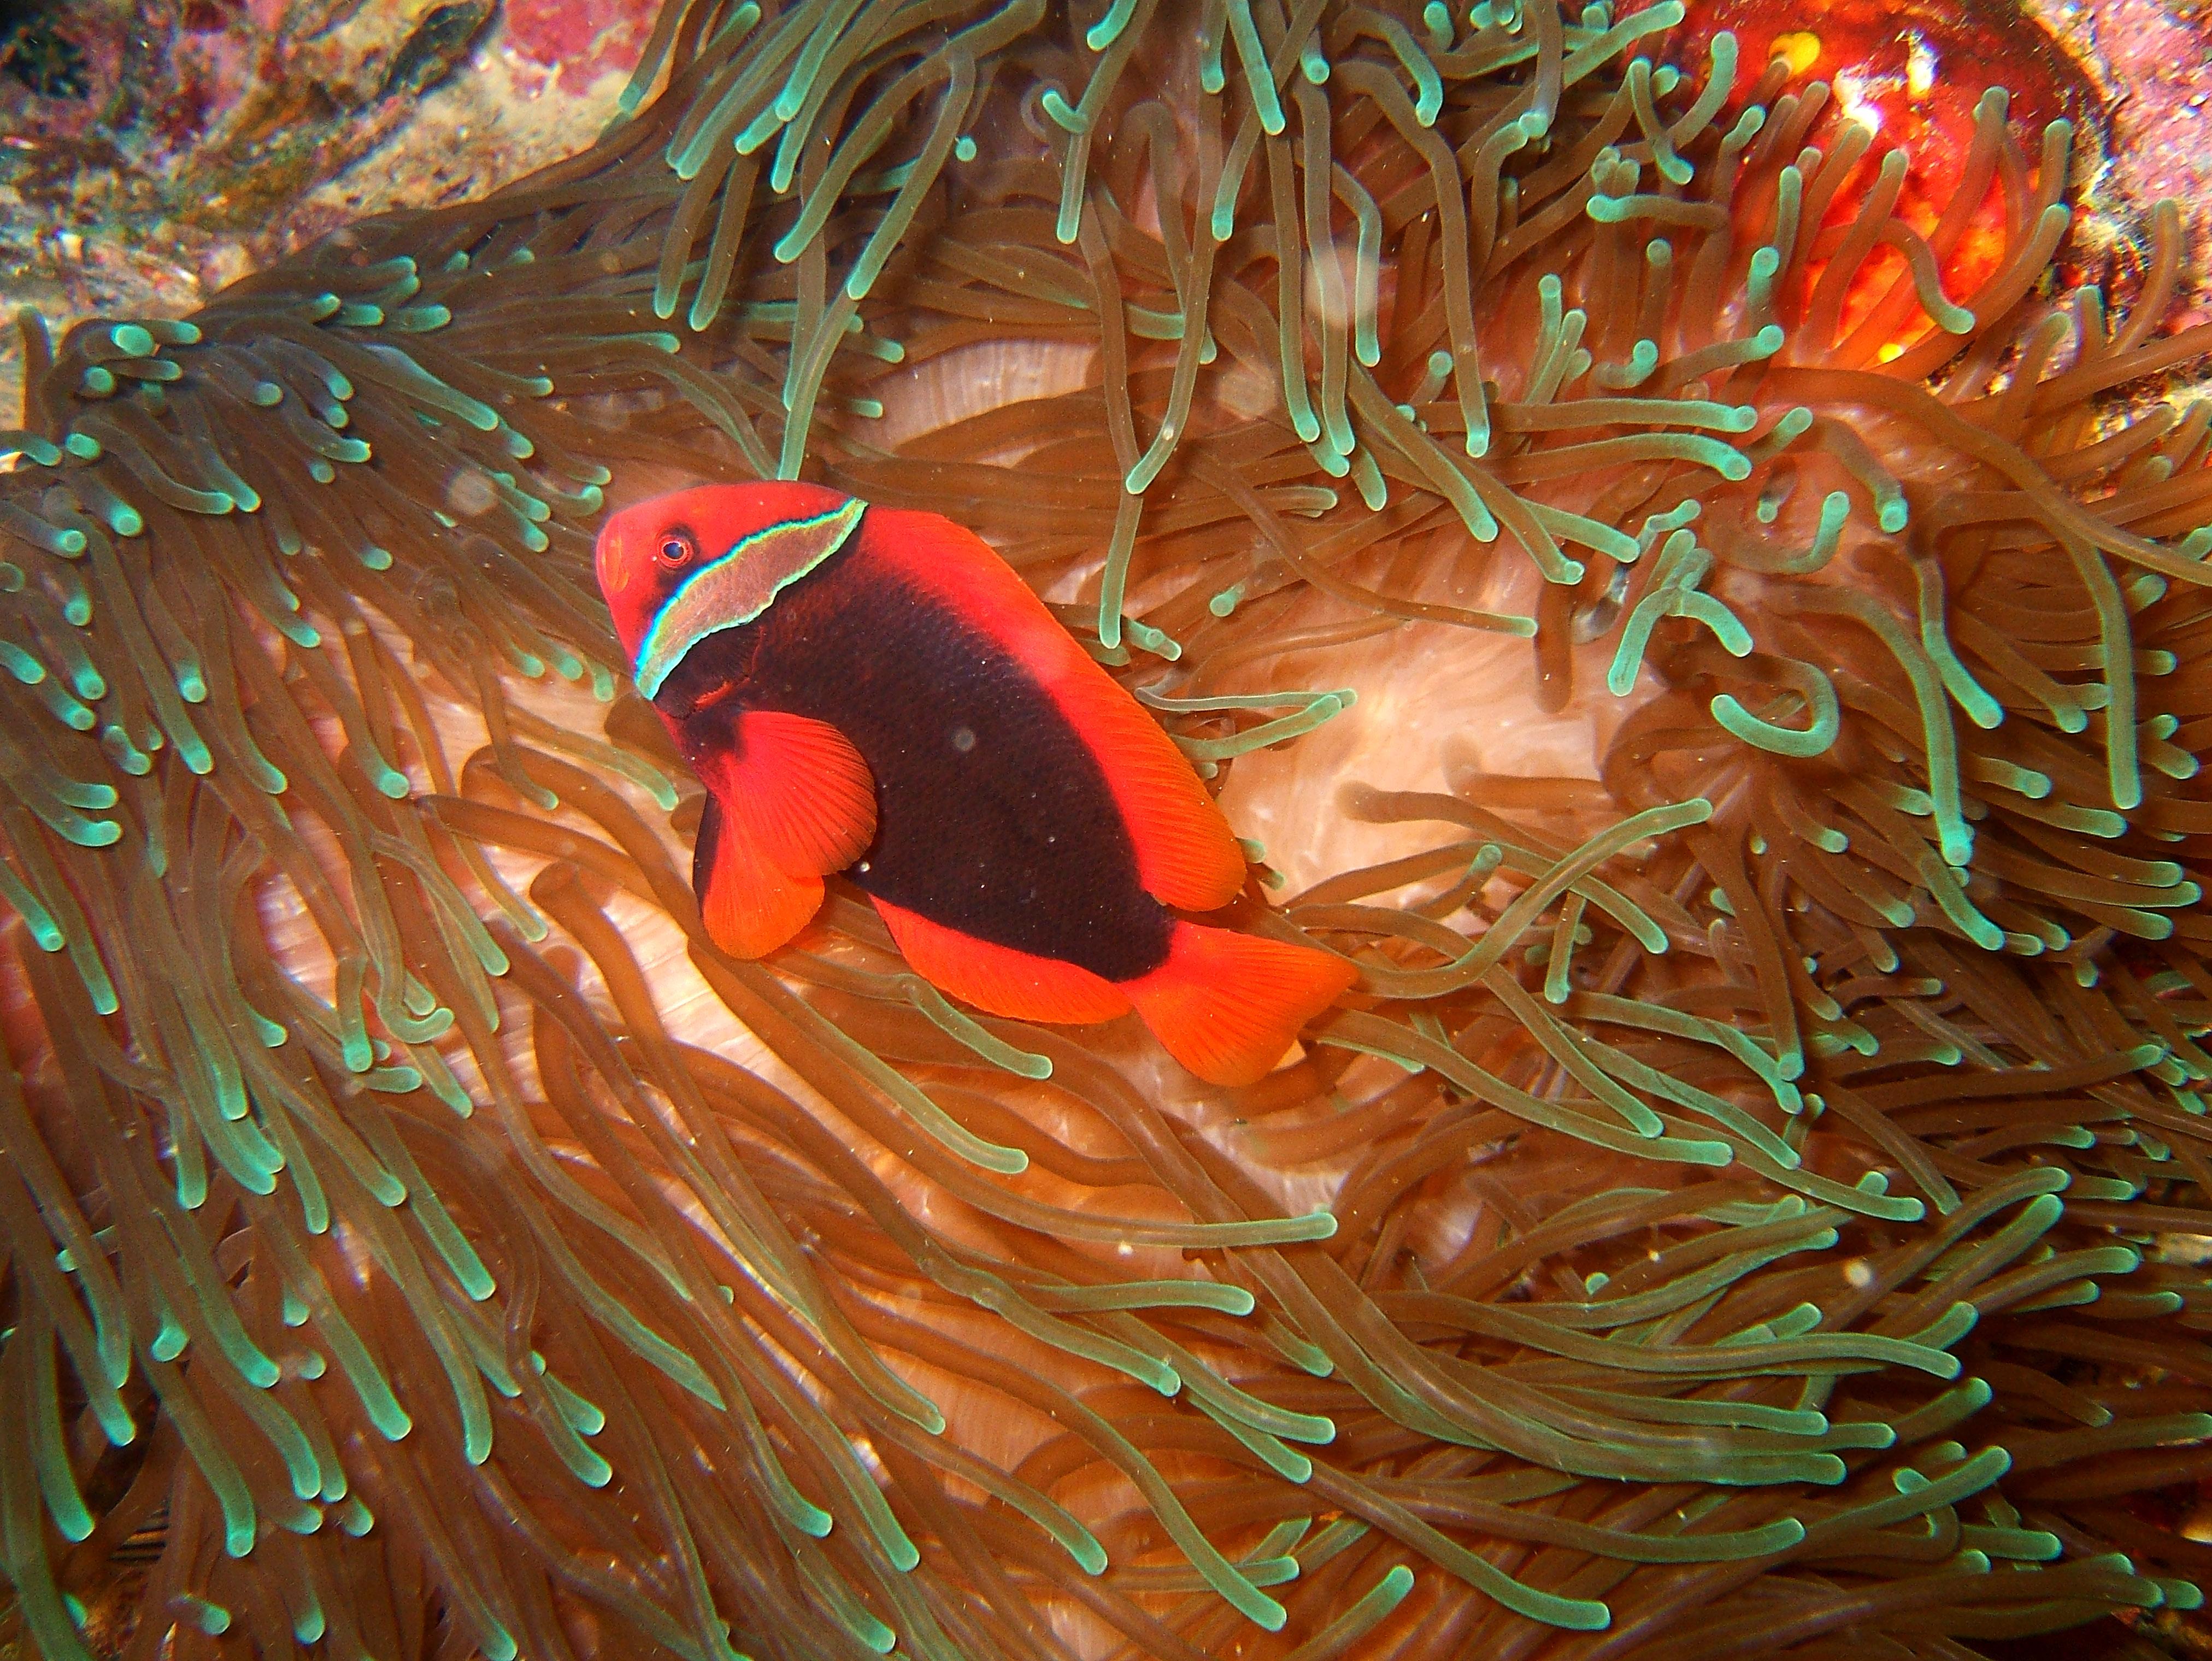 Philippines Cebu Moal Boal 20051226 Dive 1 Kasai Point 31